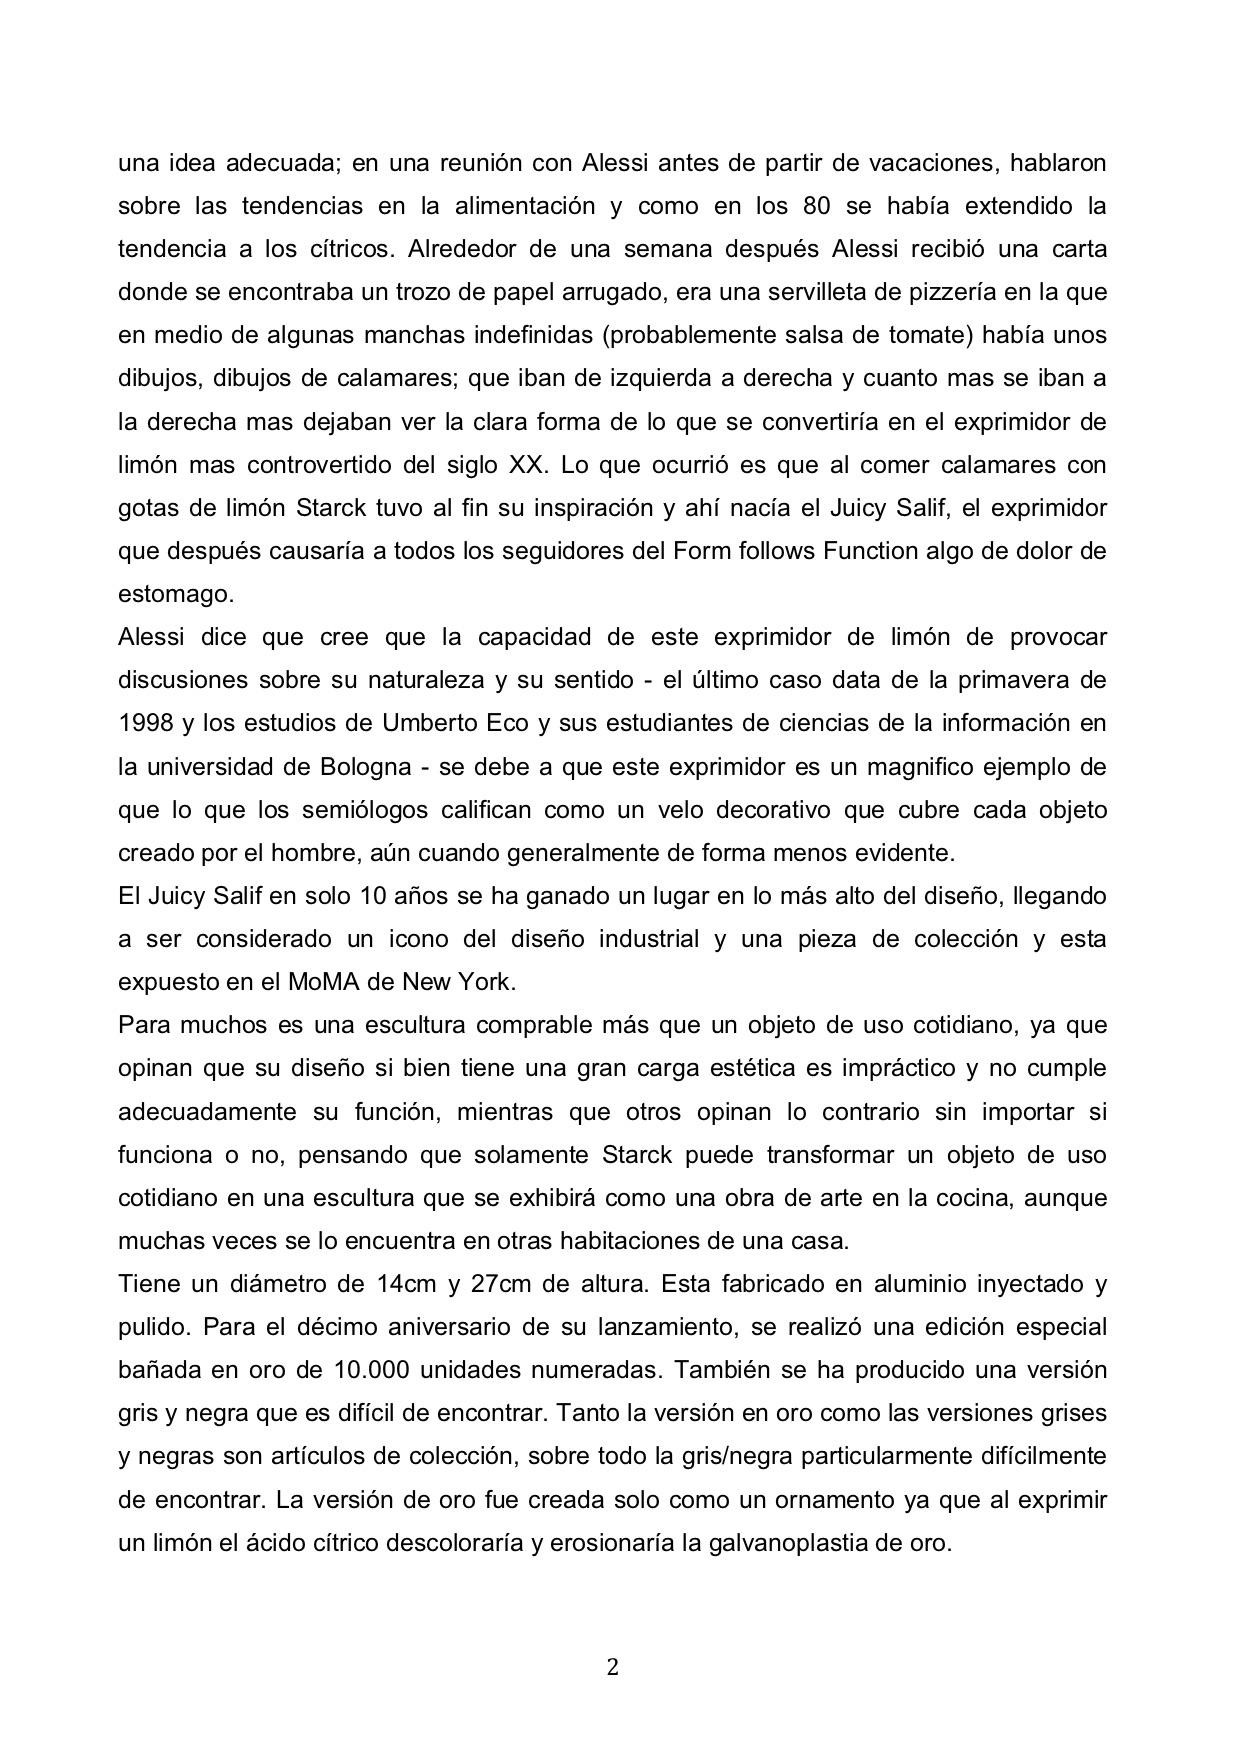 Modelo-prueba-Estudios-Superiores-de-diseño.-Llotja-2019-2